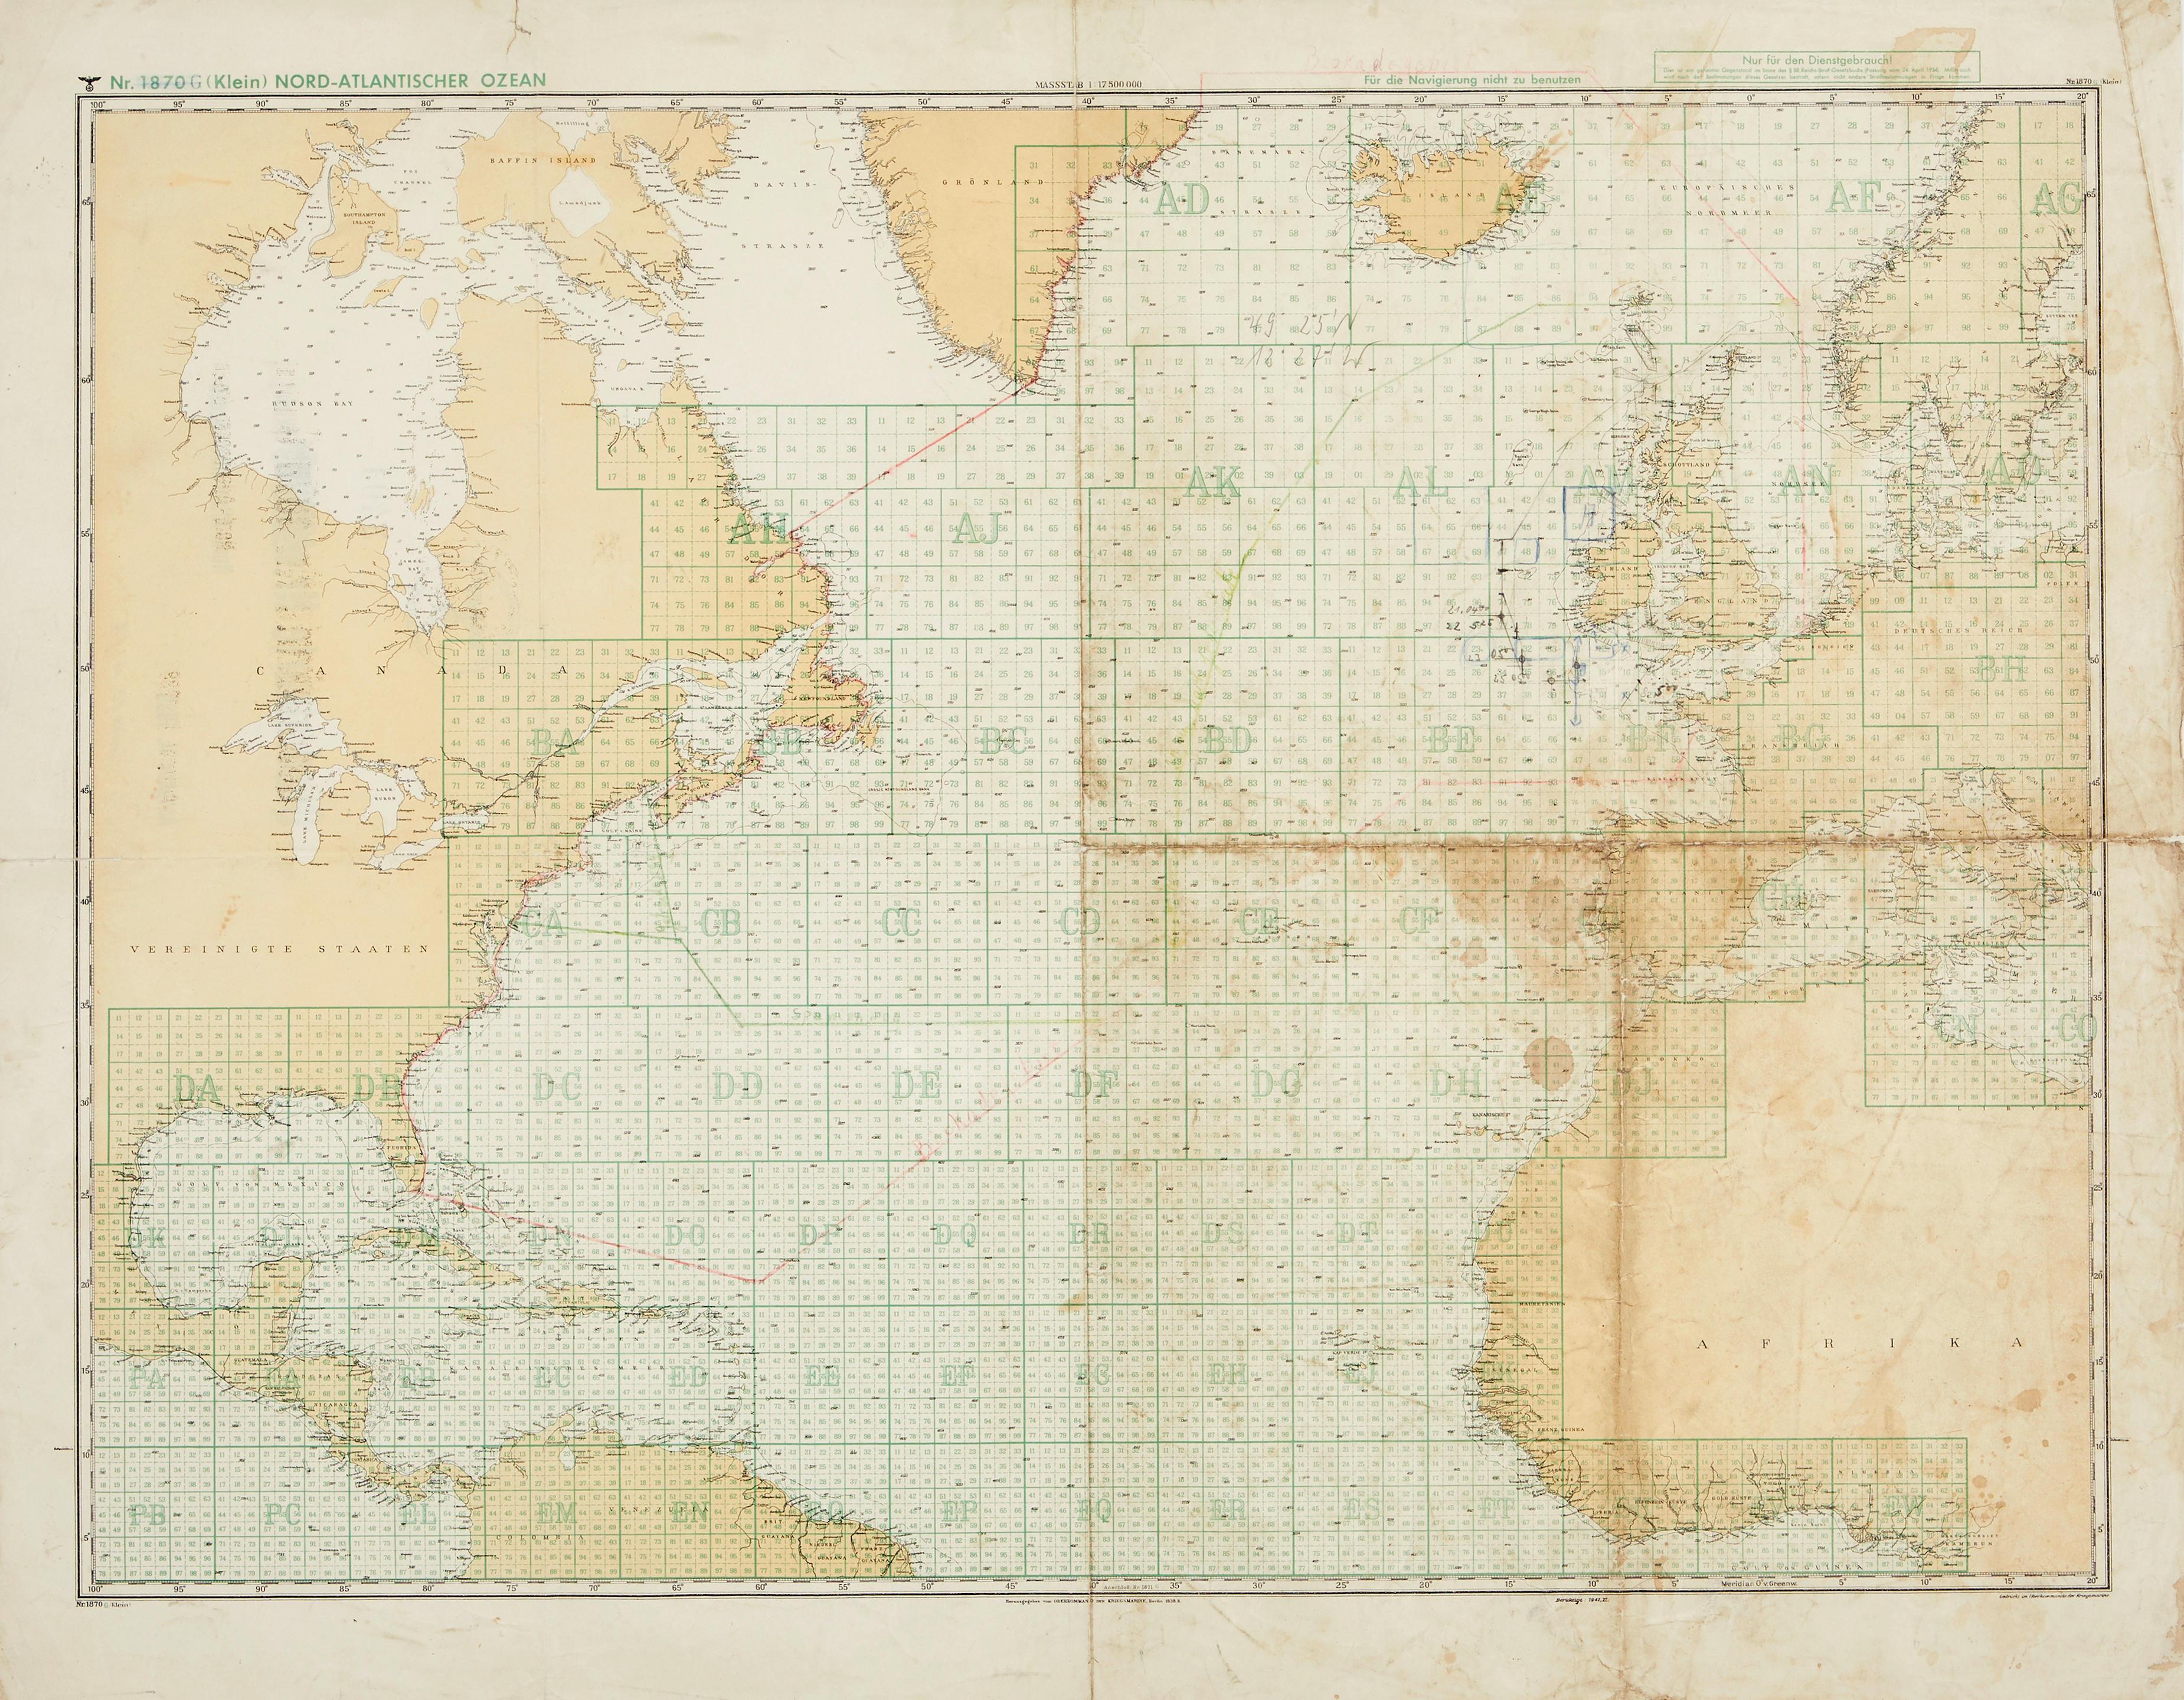 GERMAN U-BOAT CHART OF THE NORTH ATLANTIC.